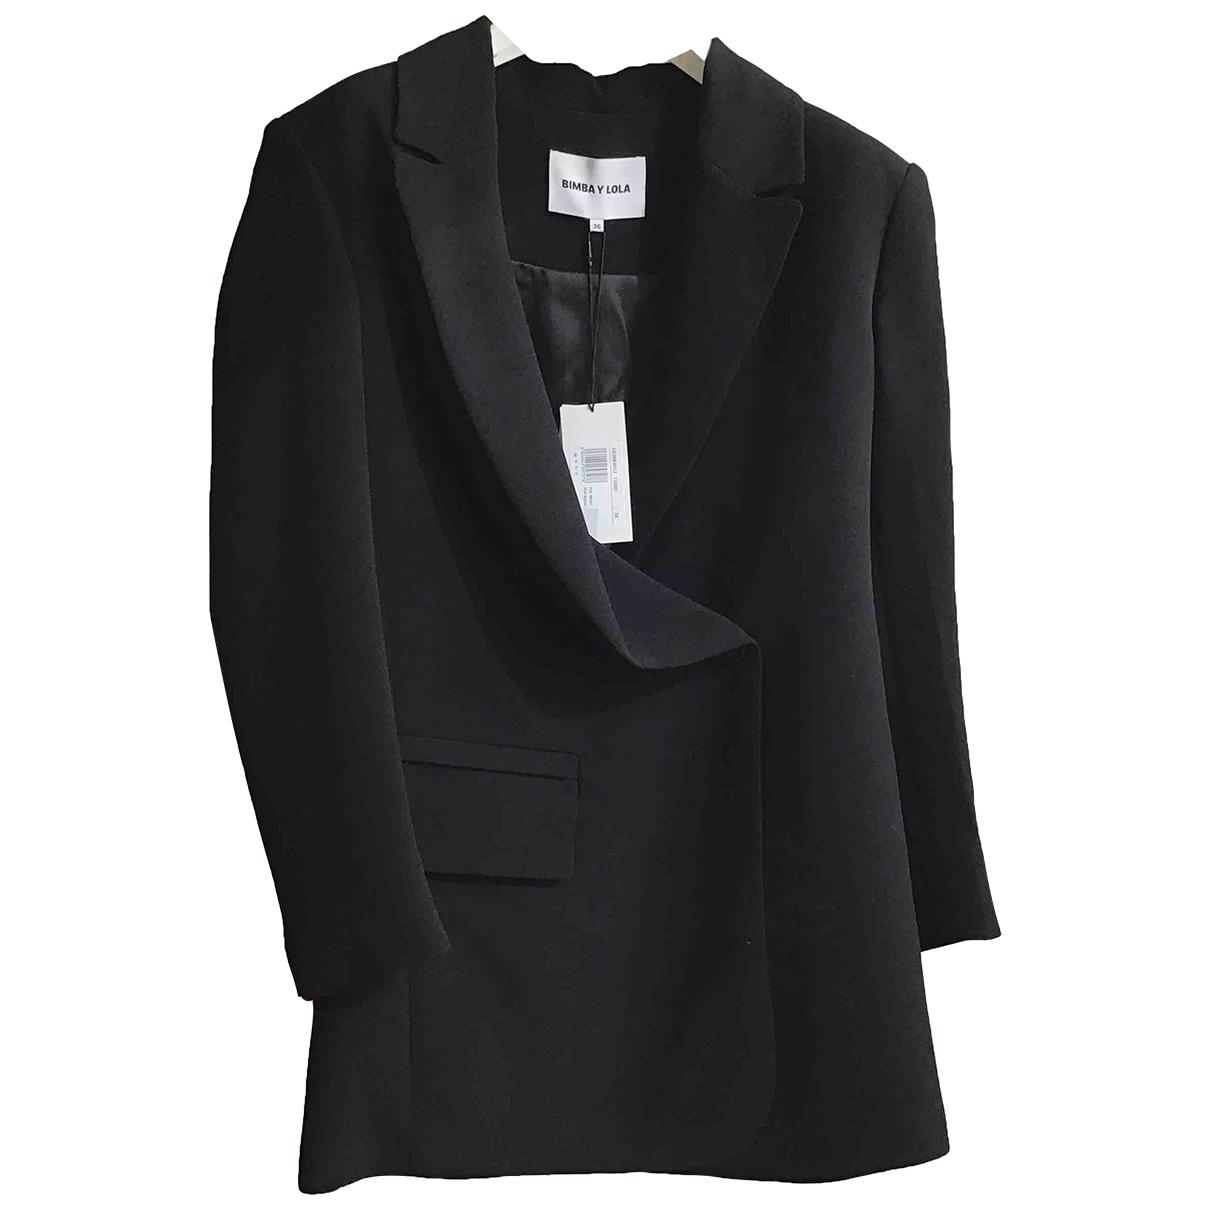 Bimba Y Lola \N Black jacket for Women 36 FR